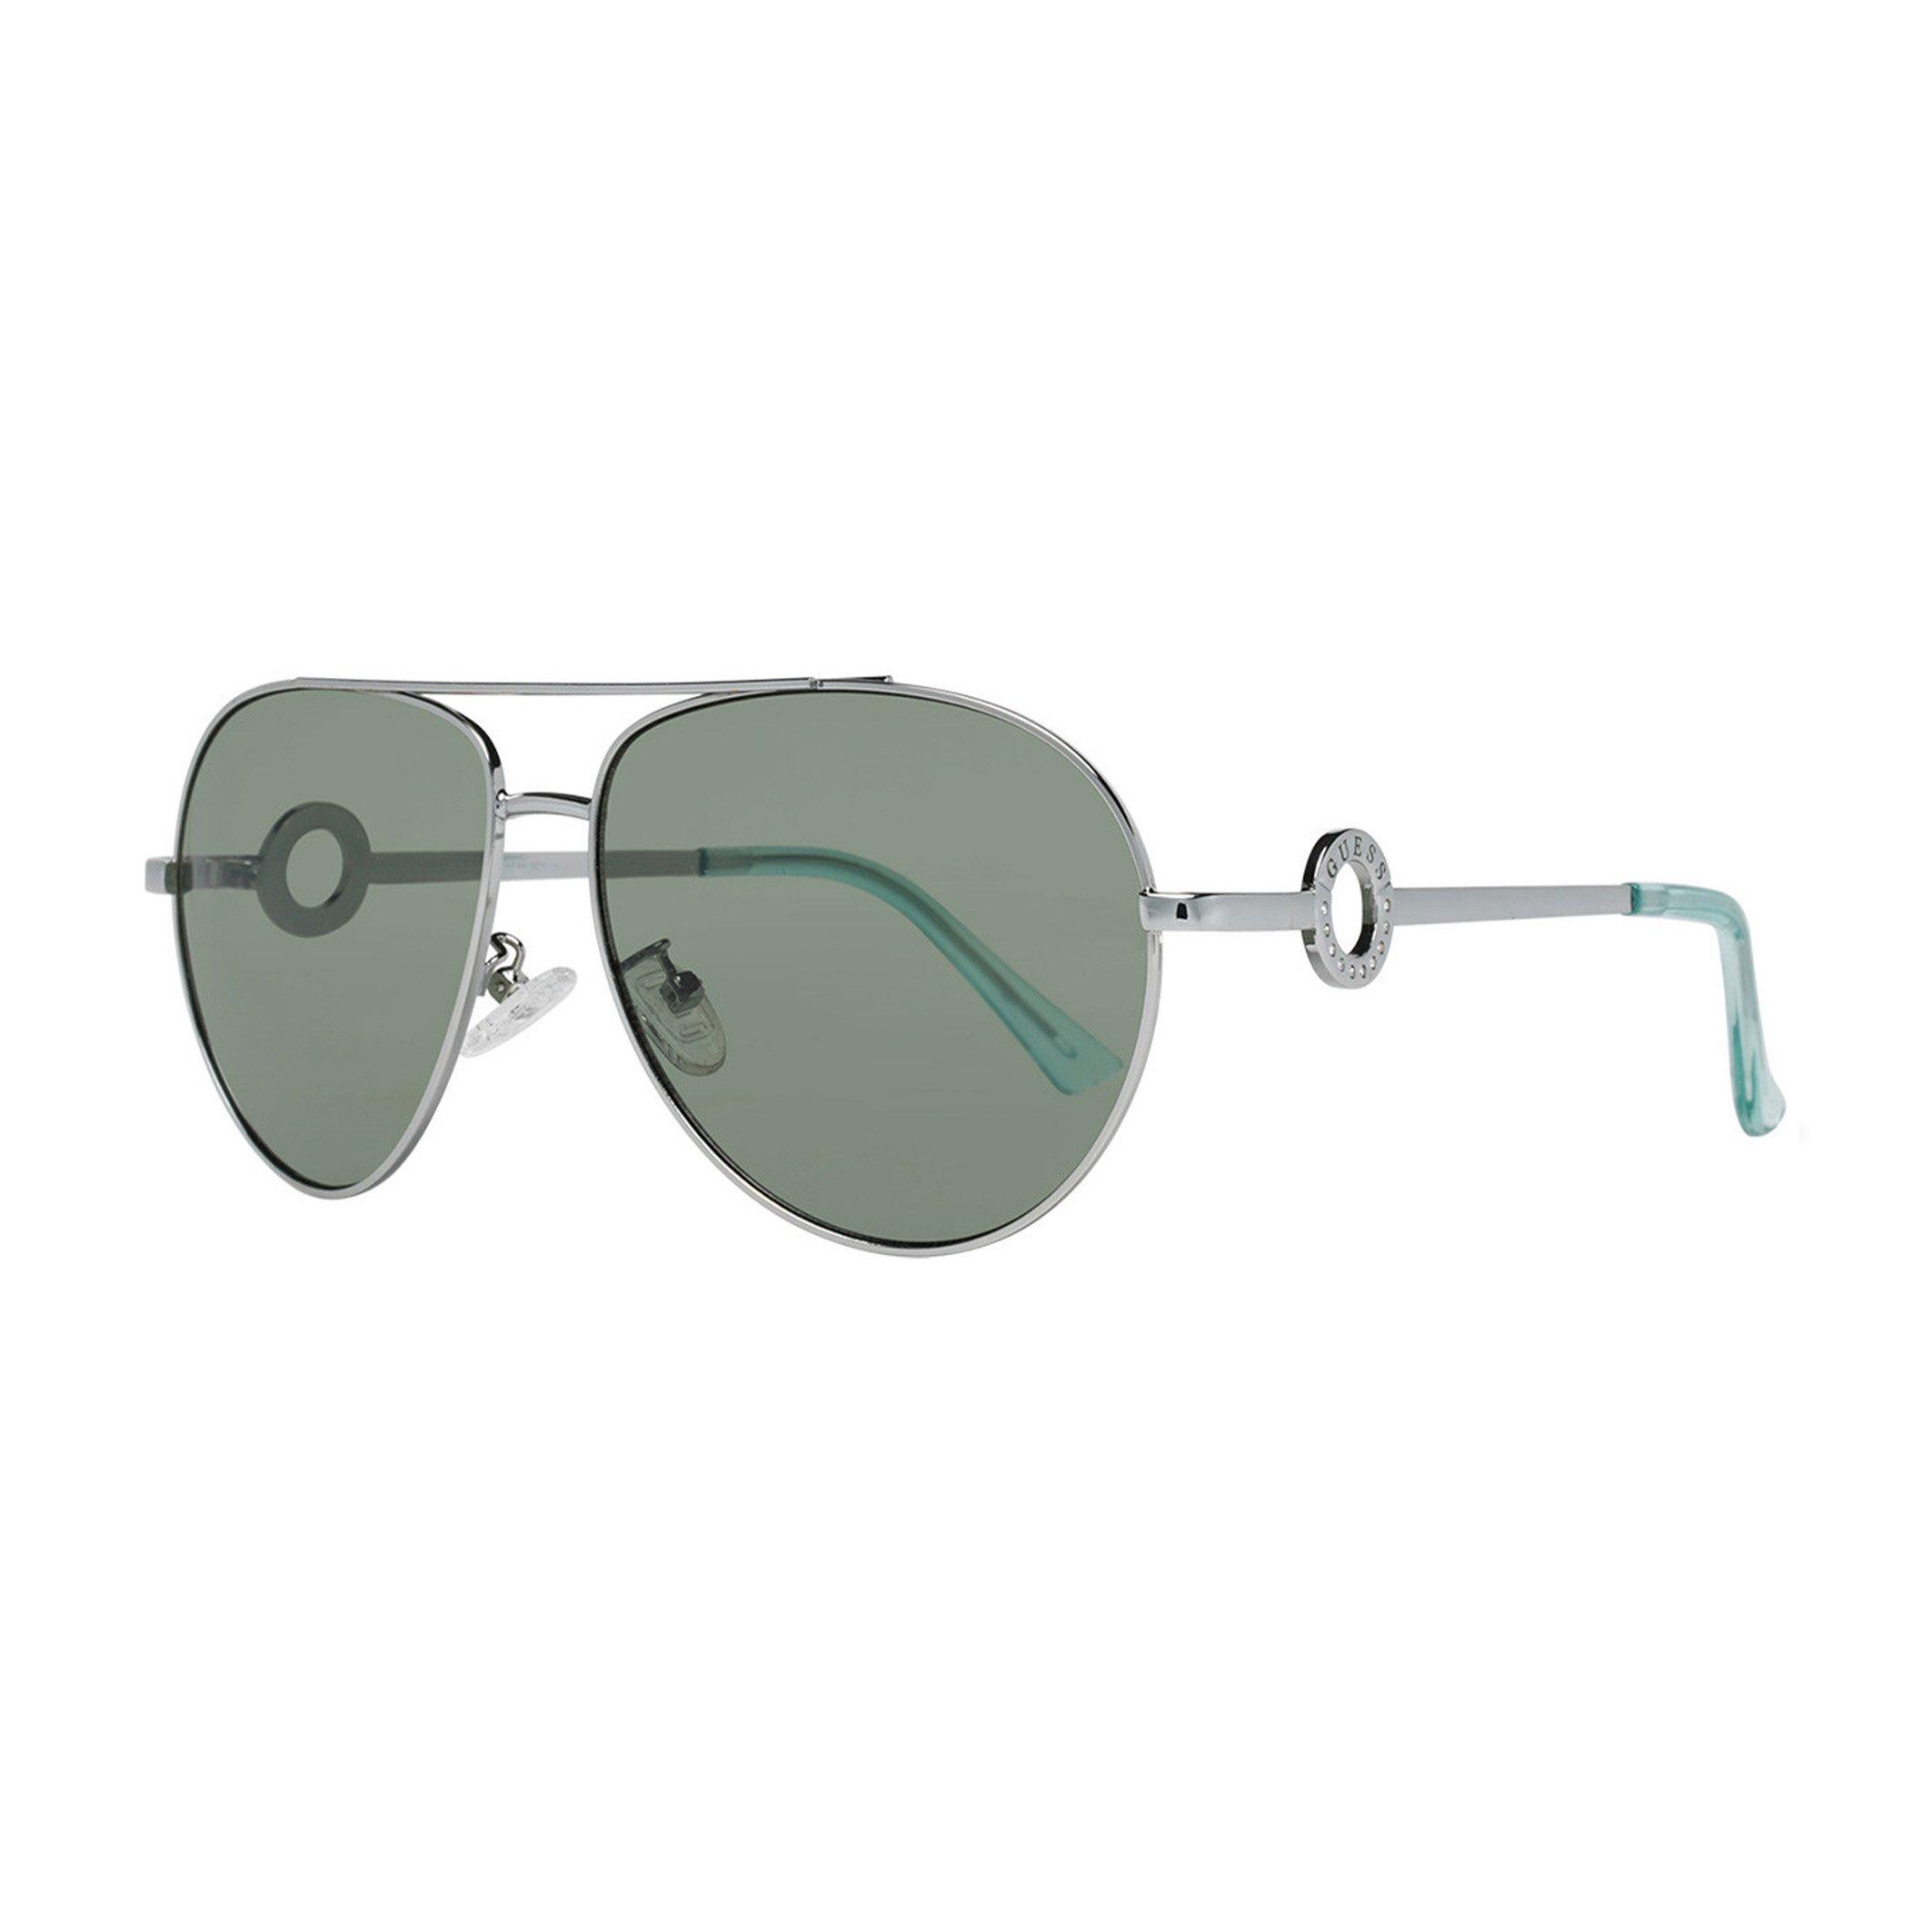 Guess Unisex Sunglasses Yellow GF0364 - grey NOSIZE